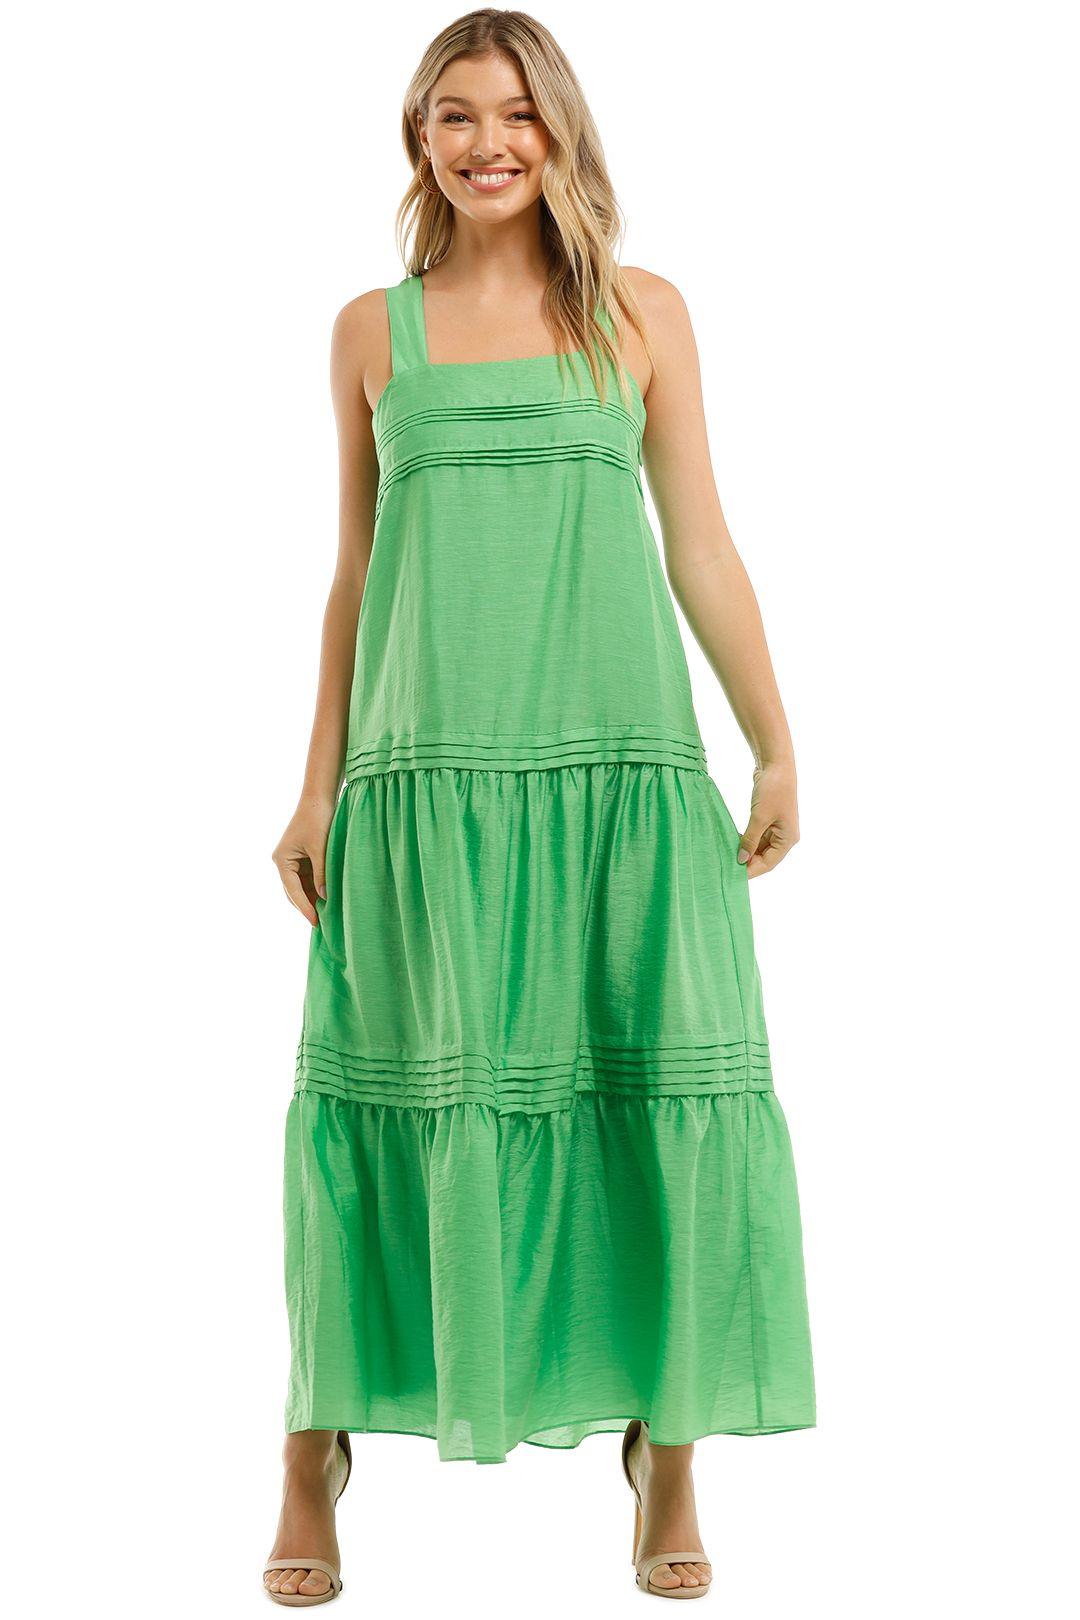 Witchery-Pintuck-Maxi-Dress-Jewel-Green-Front